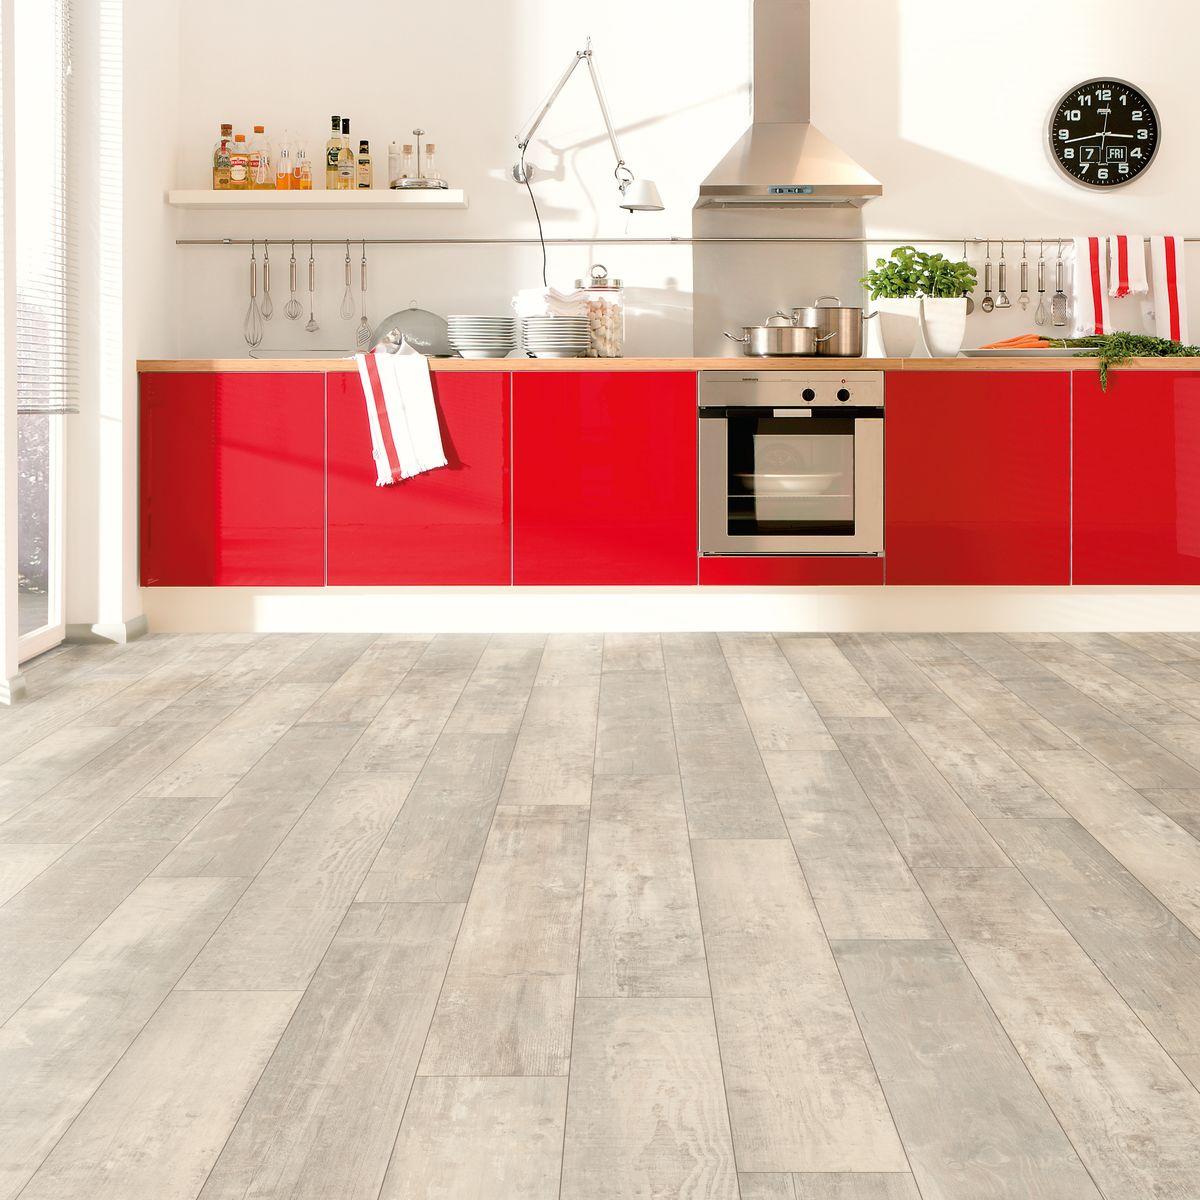 Pavimento laminato cement light 4b 8 mm prezzi e offerte - Piani tavolo leroy merlin ...